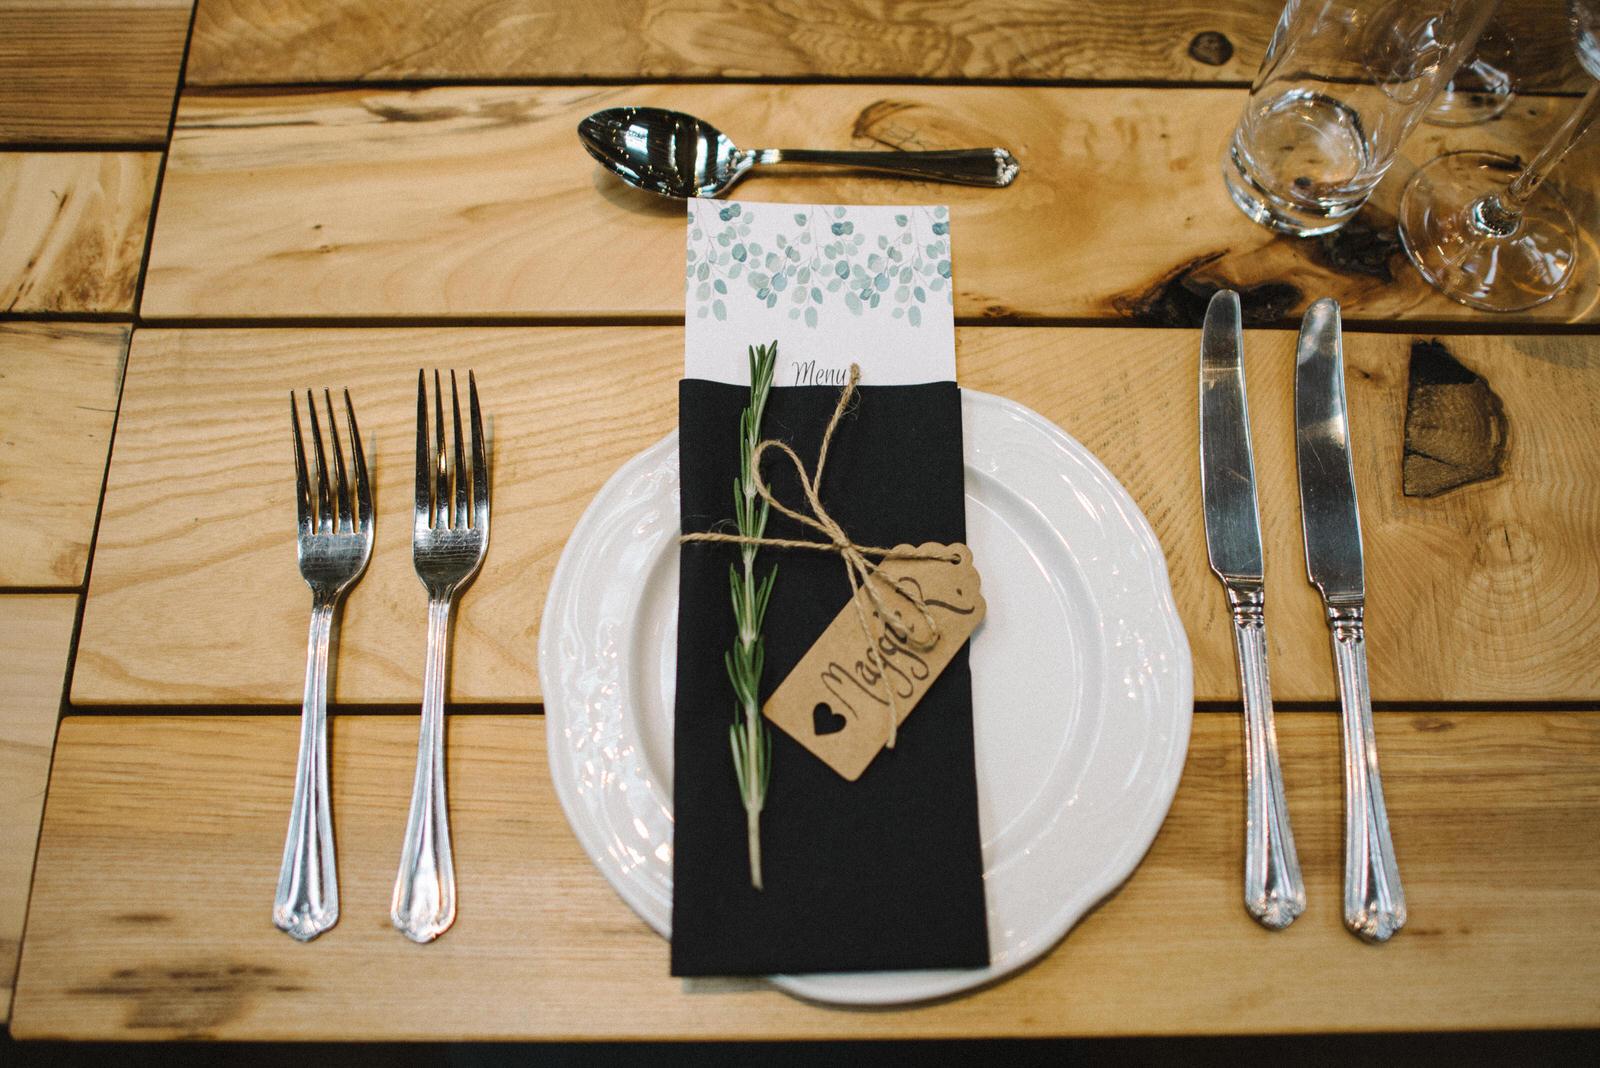 045-GUARDSWELL-FARM-WEDDING-ALTERNATIVE-SCOTTISH-WEDDING-PHOTOGRAPHER-SCOTTISH-WEDDING-DESTINATION-WEDDING-PHOTOGRAPHER.JPG